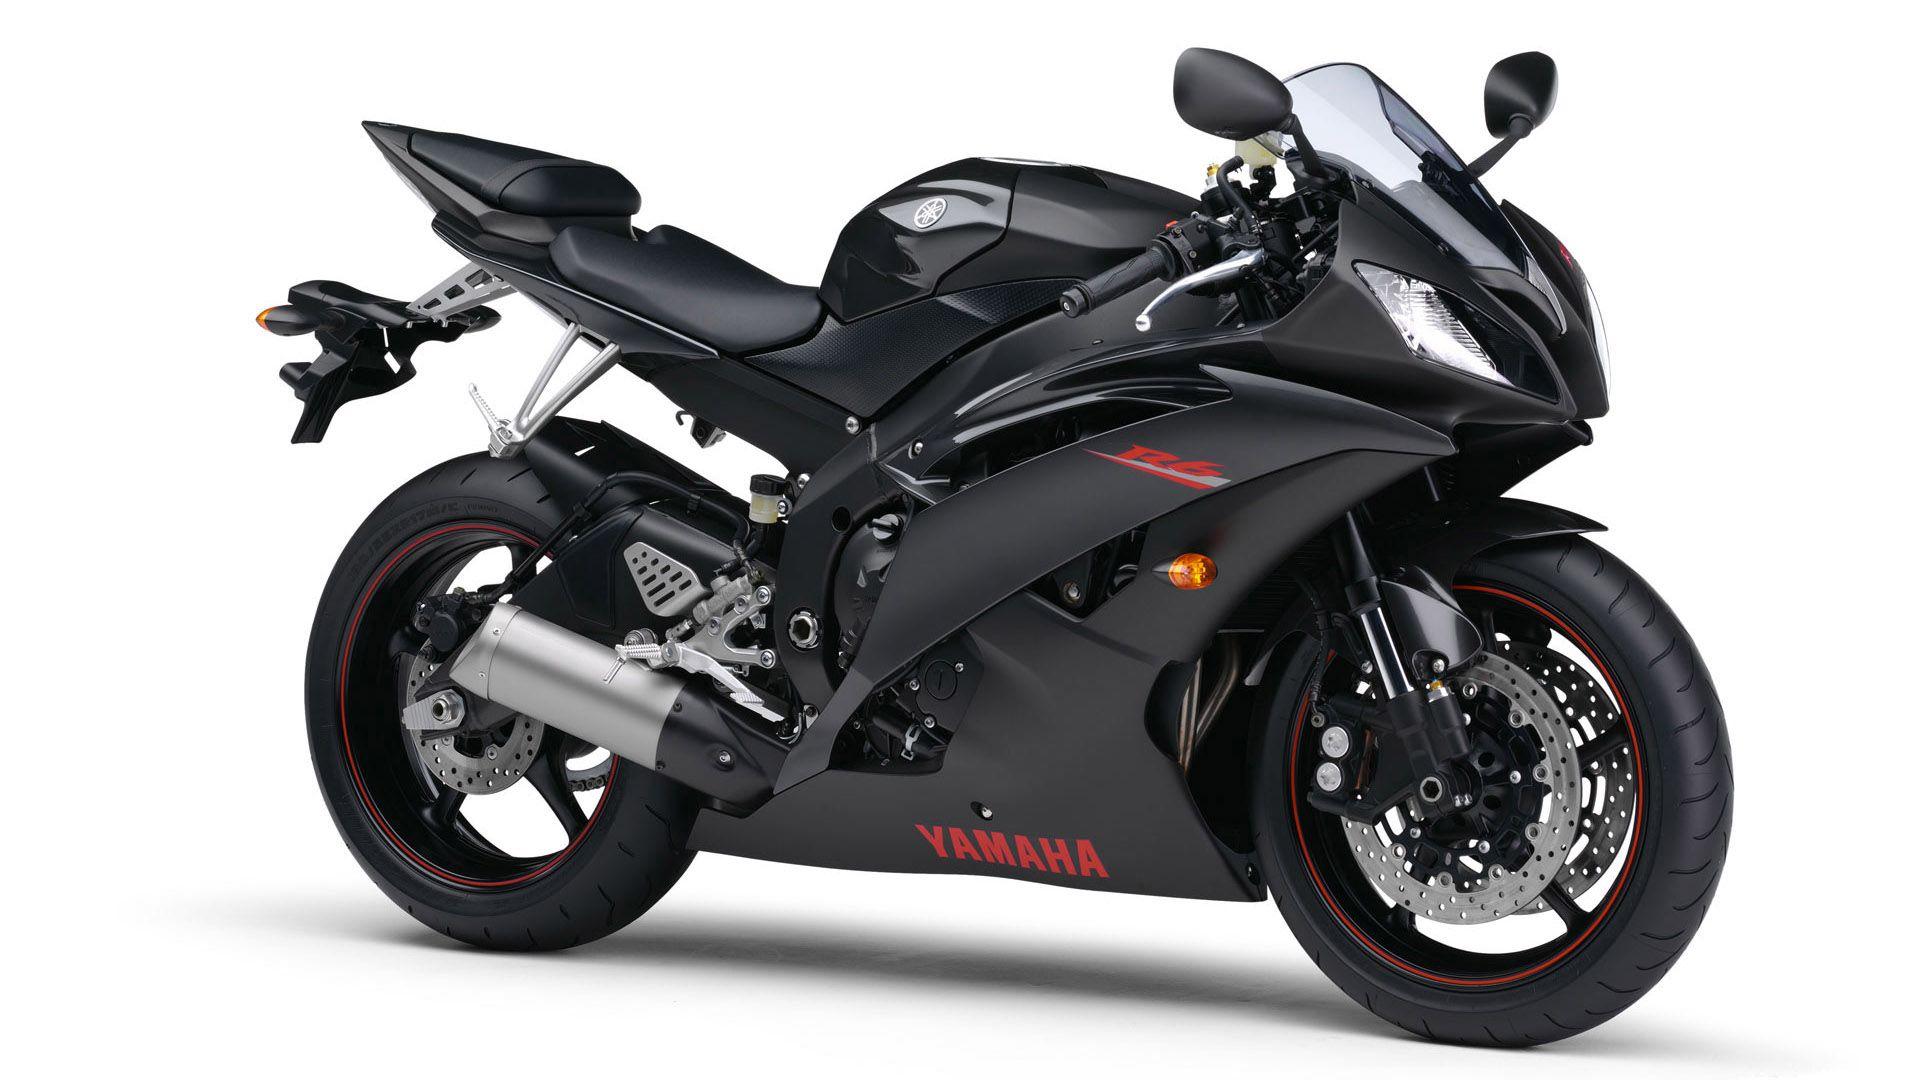 Yamaha r6 black wallpaper hd httpimashonwmotoyamaha r6 yamaha r6 black wallpaper hd httpimashonw altavistaventures Images